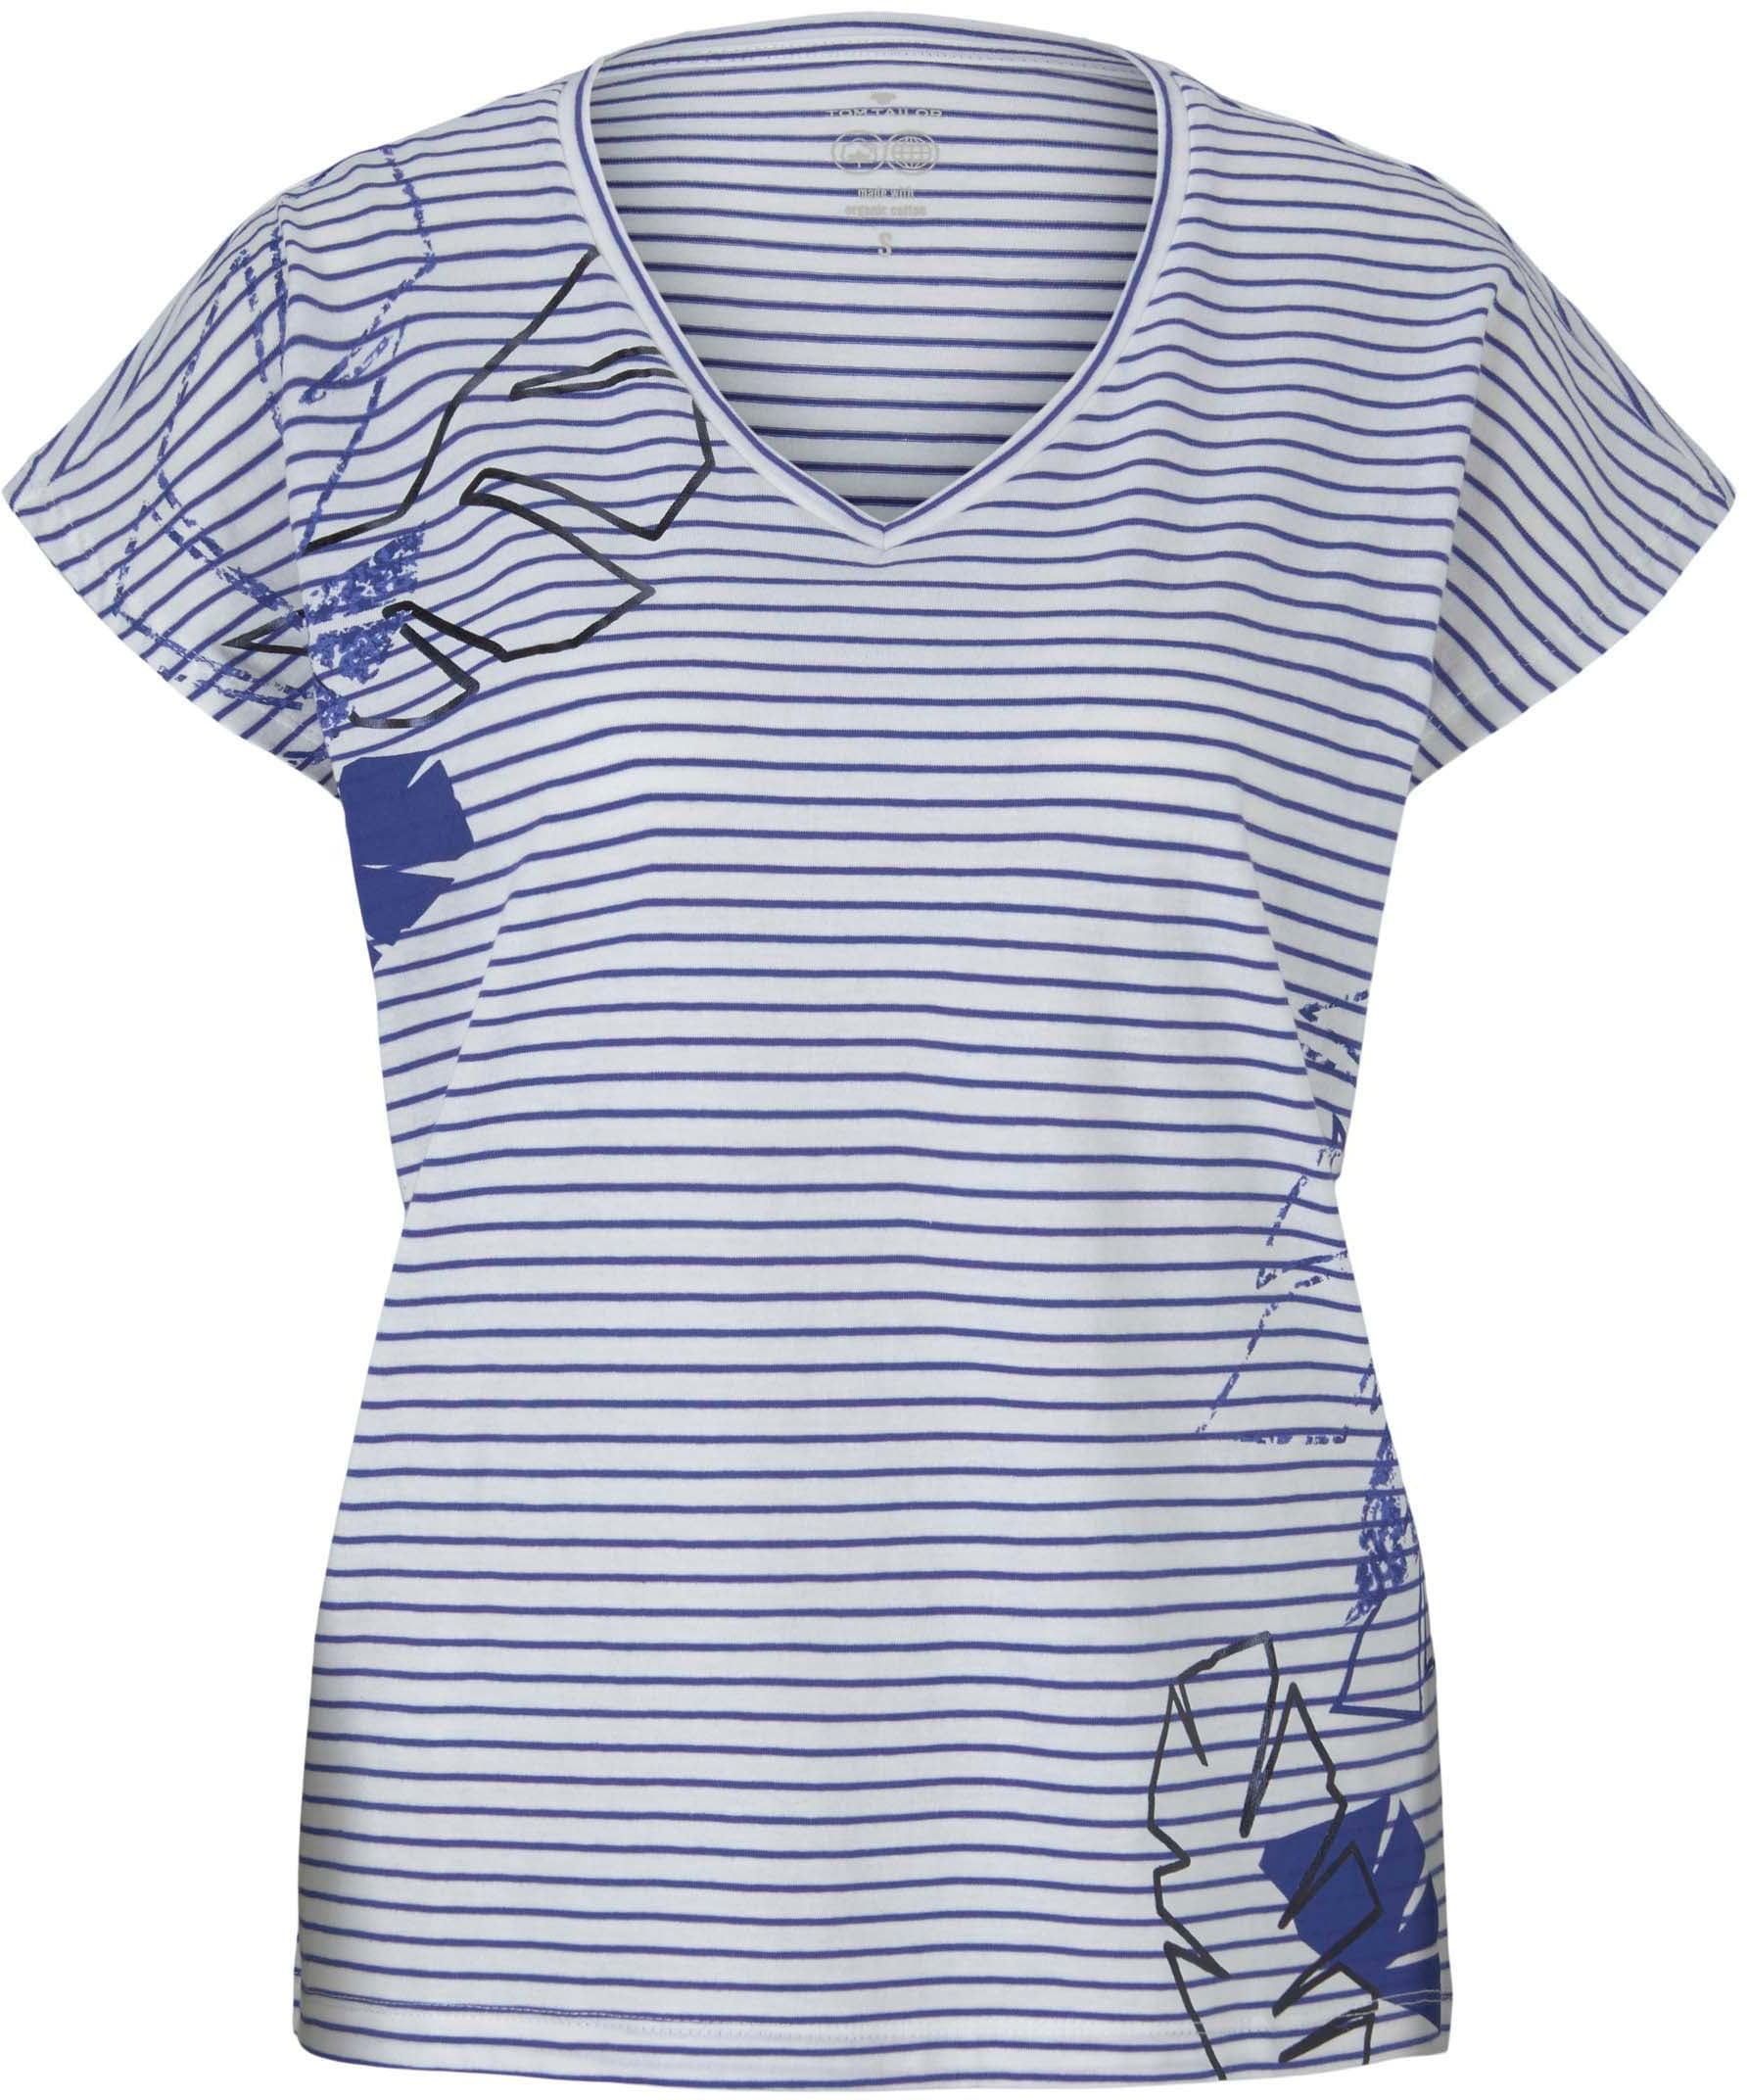 tom tailor -  V-Shirt, mit Print